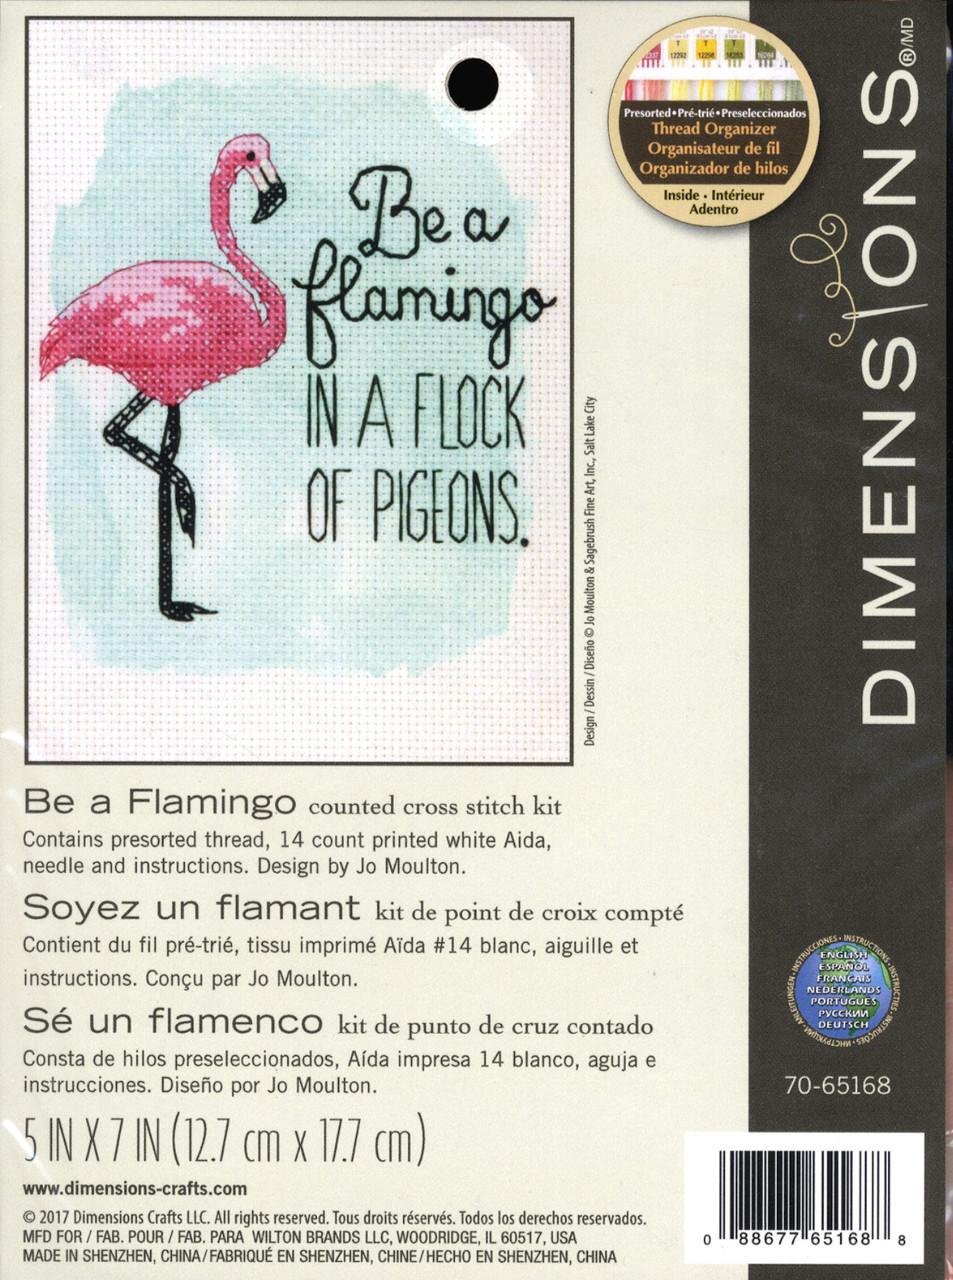 Dimensions - Be a Flamingo